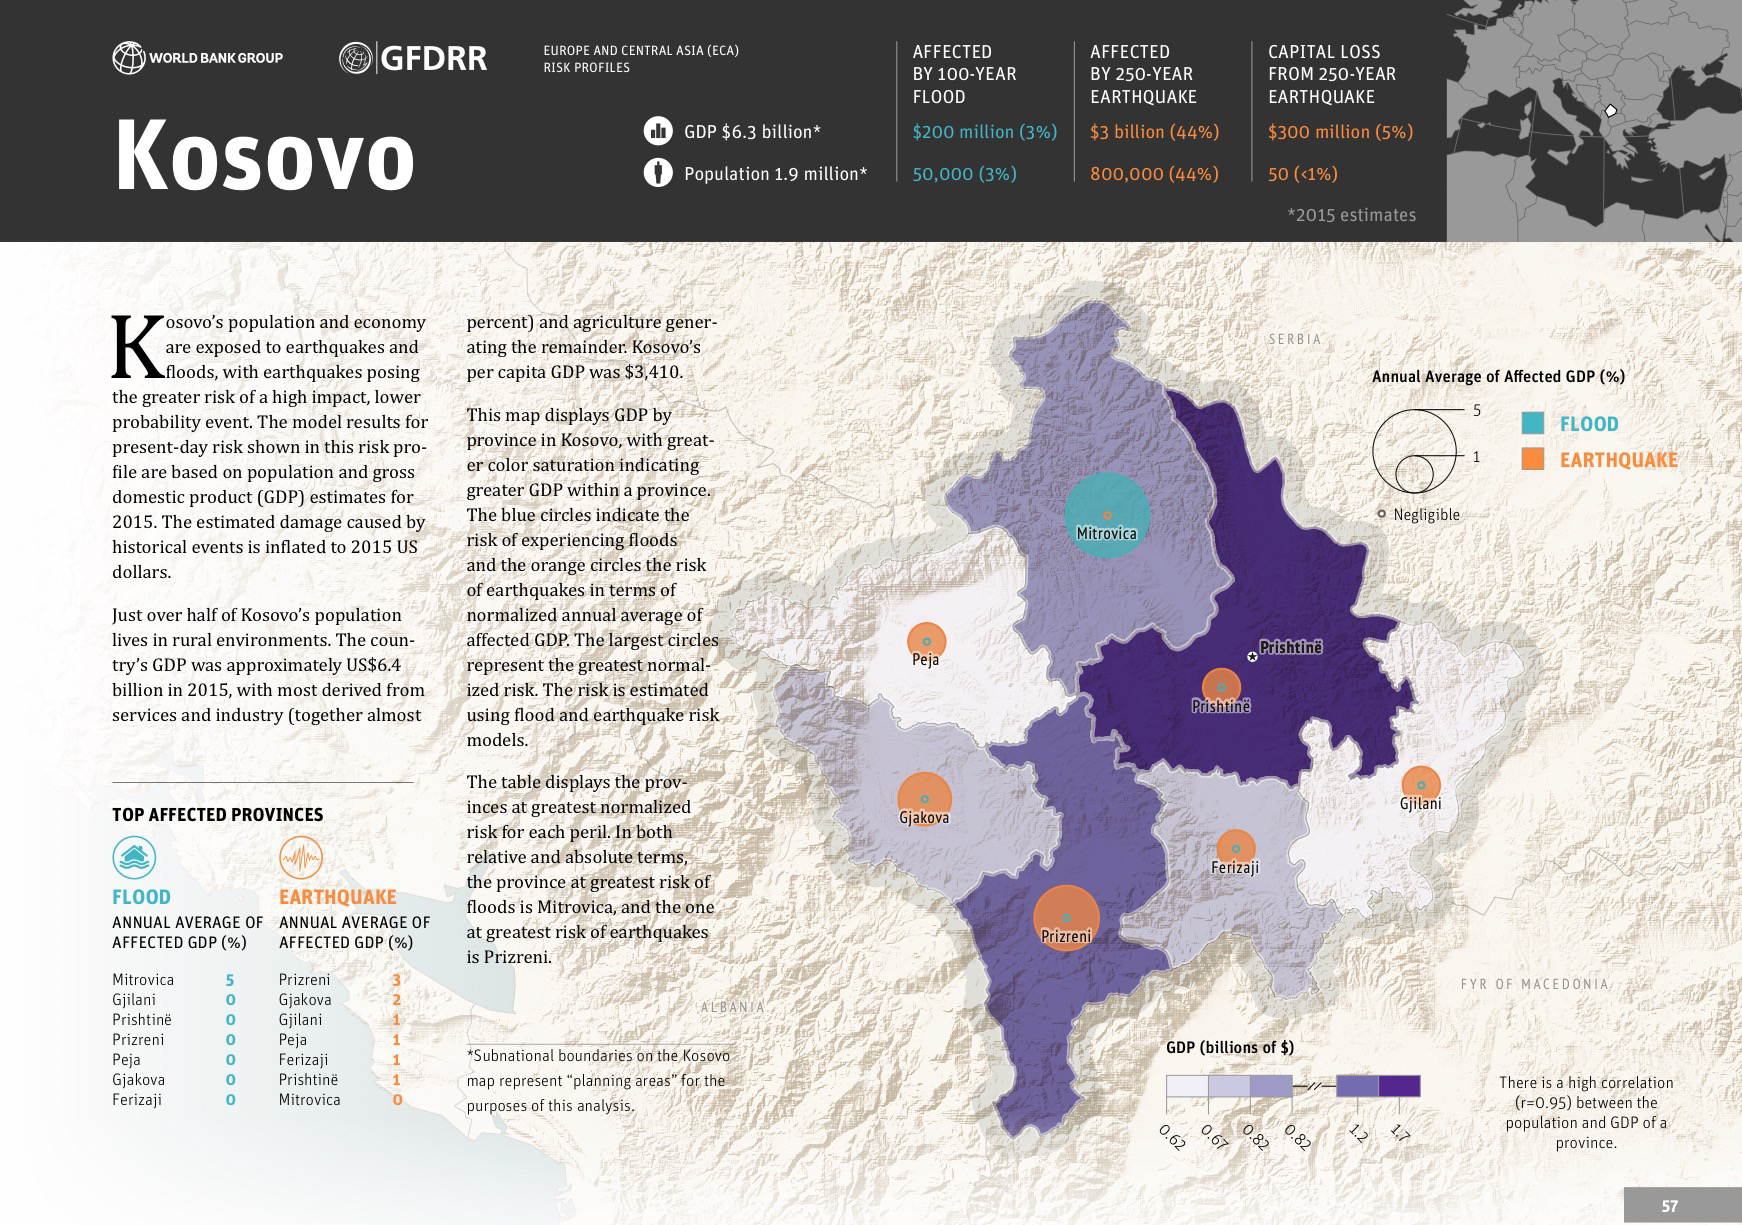 Disaster Risk Profile: Kosovo   GFDRR on serbia map, kosovo road map, kosovo region, kosovo on the map, pristina kosovo on world map, montenegro map, kosovo war map, belgrade on world map, albania map, kosovo on world map show,